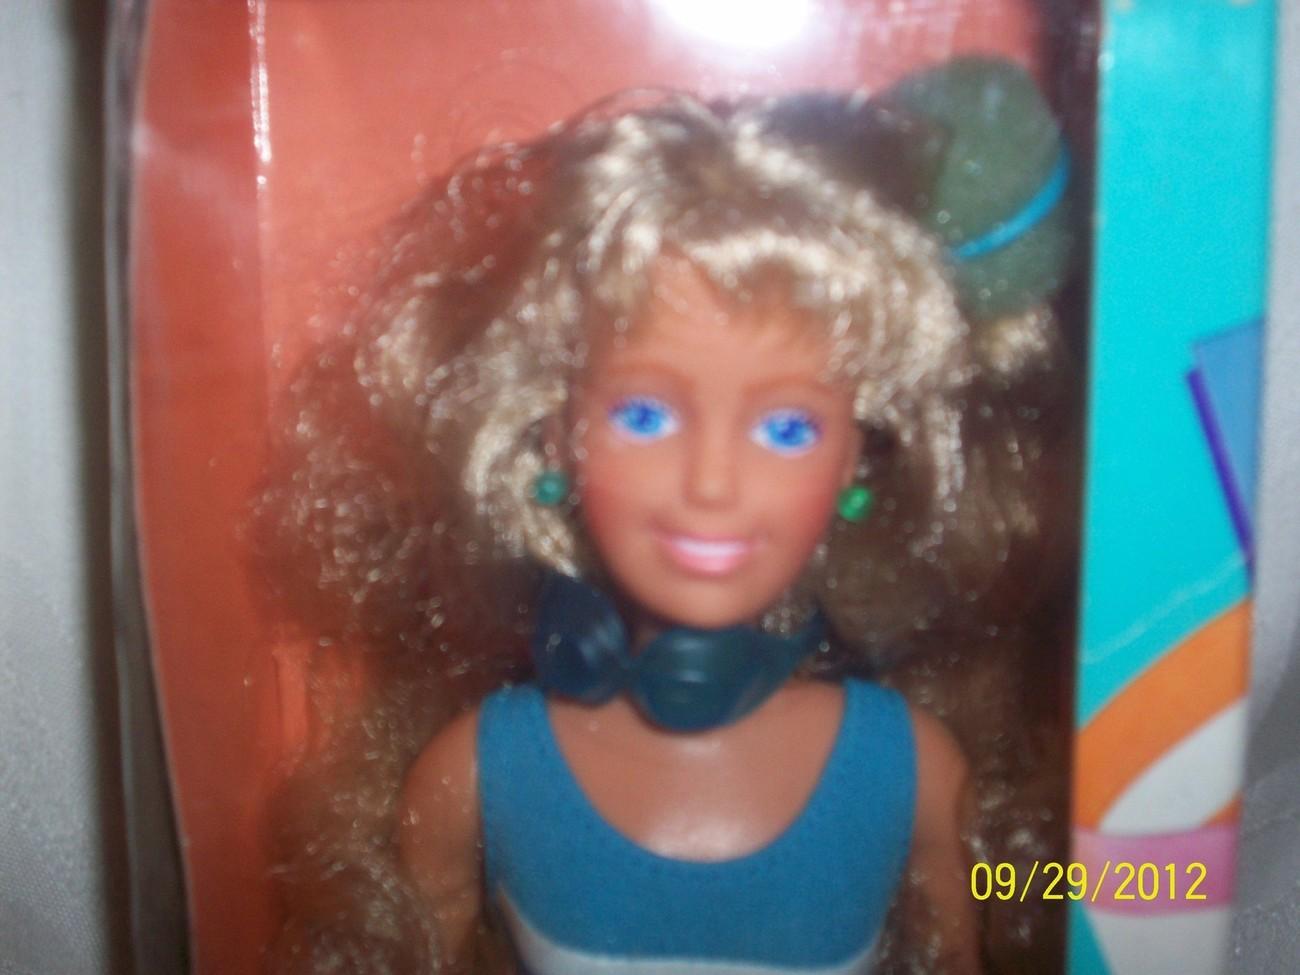 MIB Vintage 1980's Mod Hasbro Maxie Doll New in Box NIB NRFB image 2